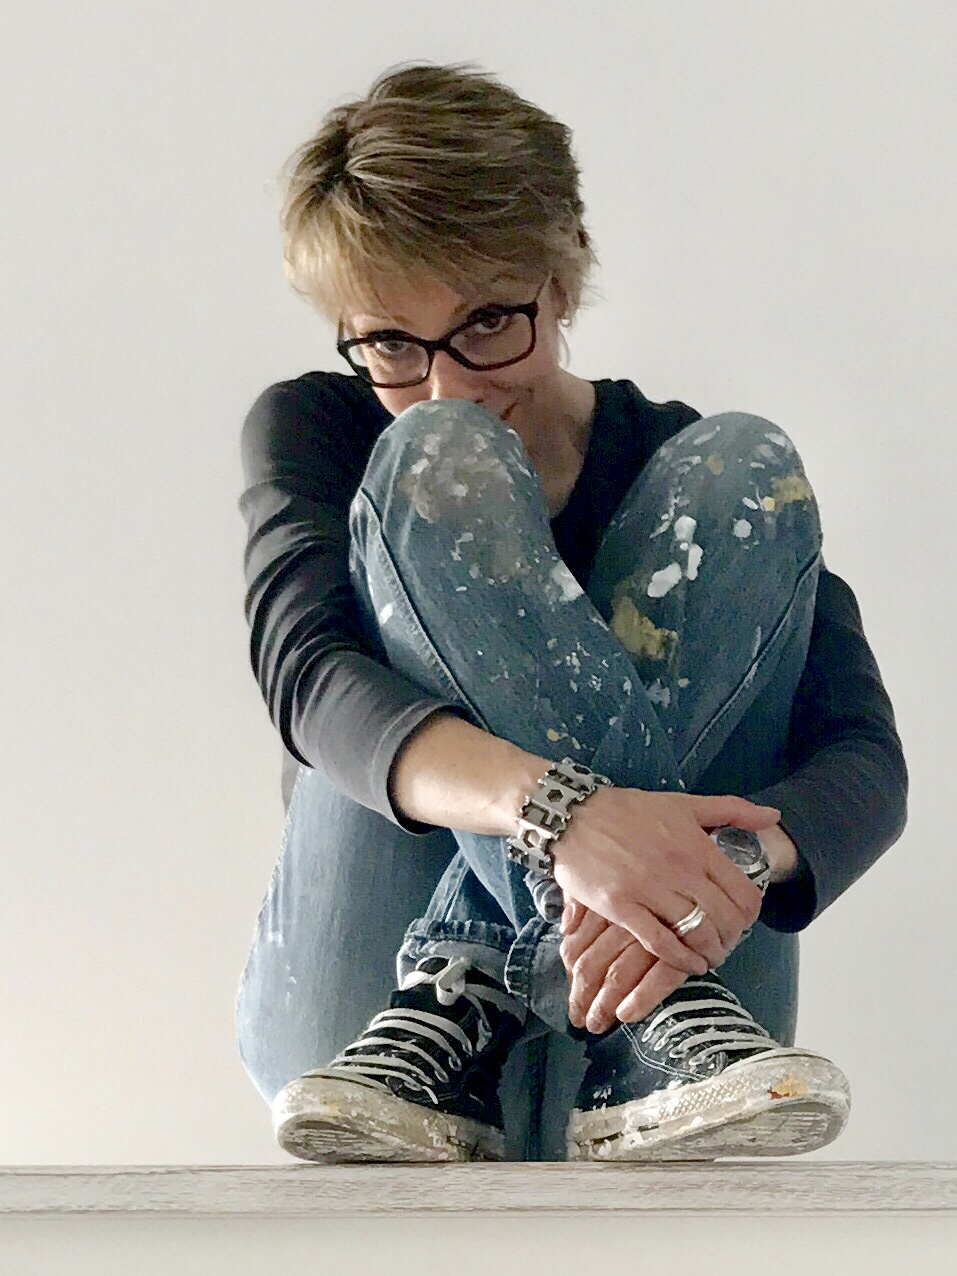 Chalet8/ DIY Blog/ Sandra Losch/ DIY/ Upcycling/ Deko/ Interior/ Ideen/ Anleitungen/ Inspirationen/ Naturverbundene Wohn-Accessoires